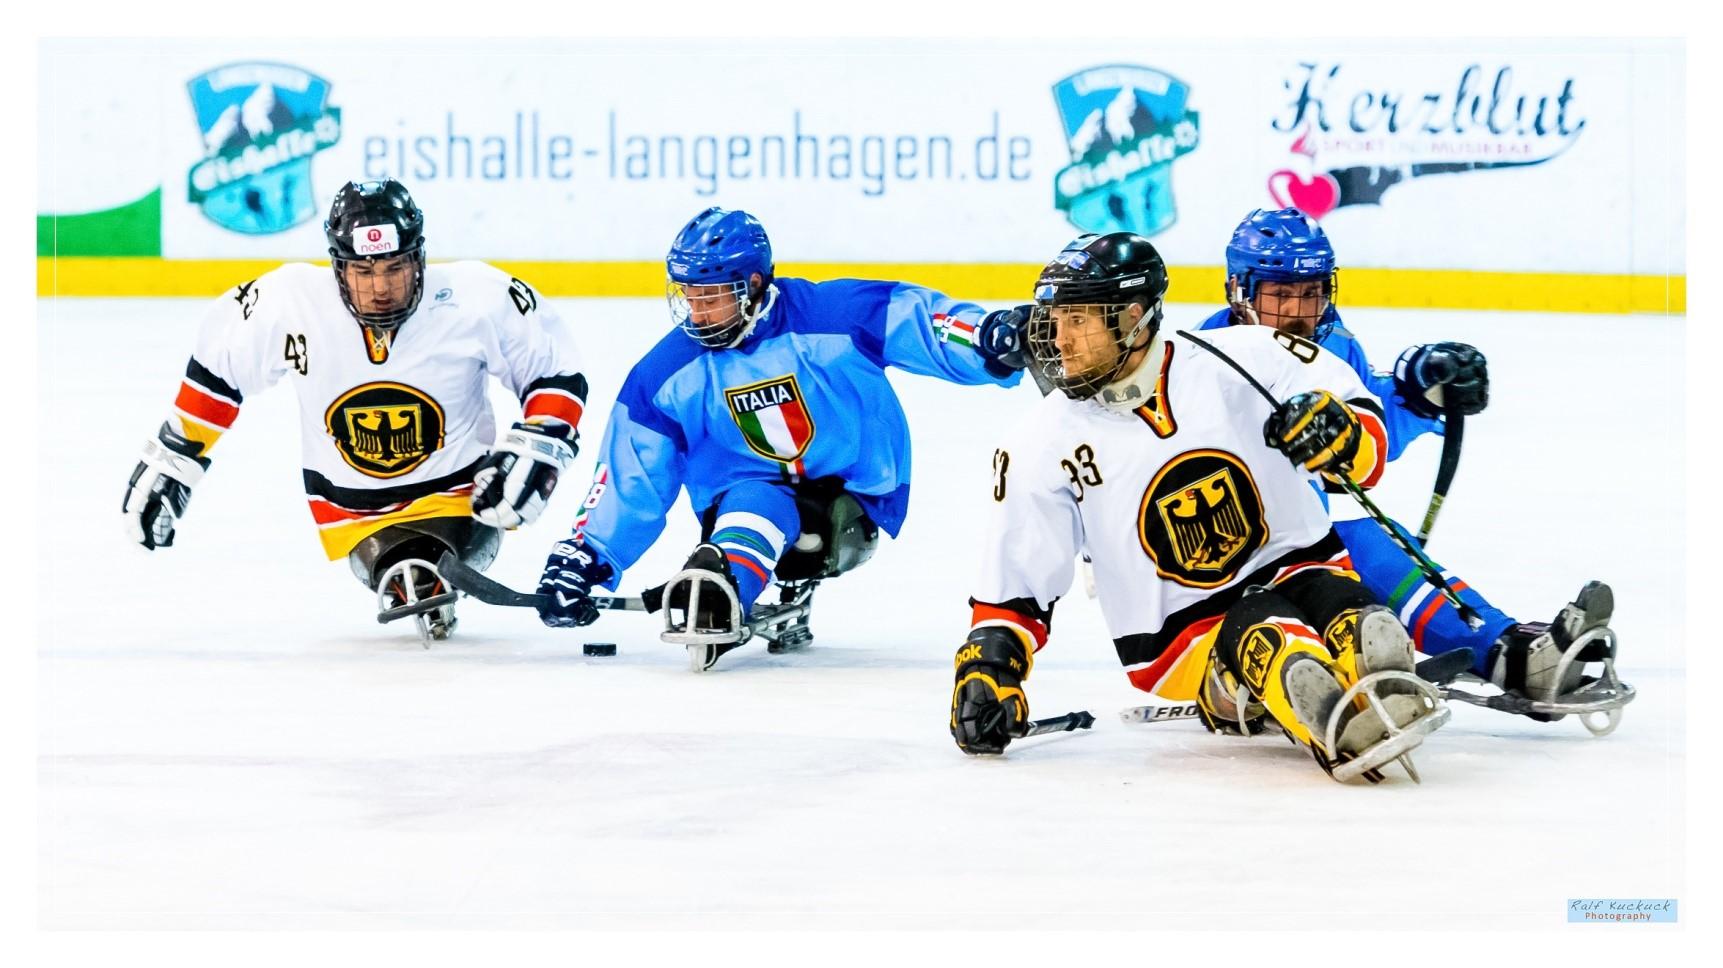 Sledge-Eishockey Ralf Kuckuck